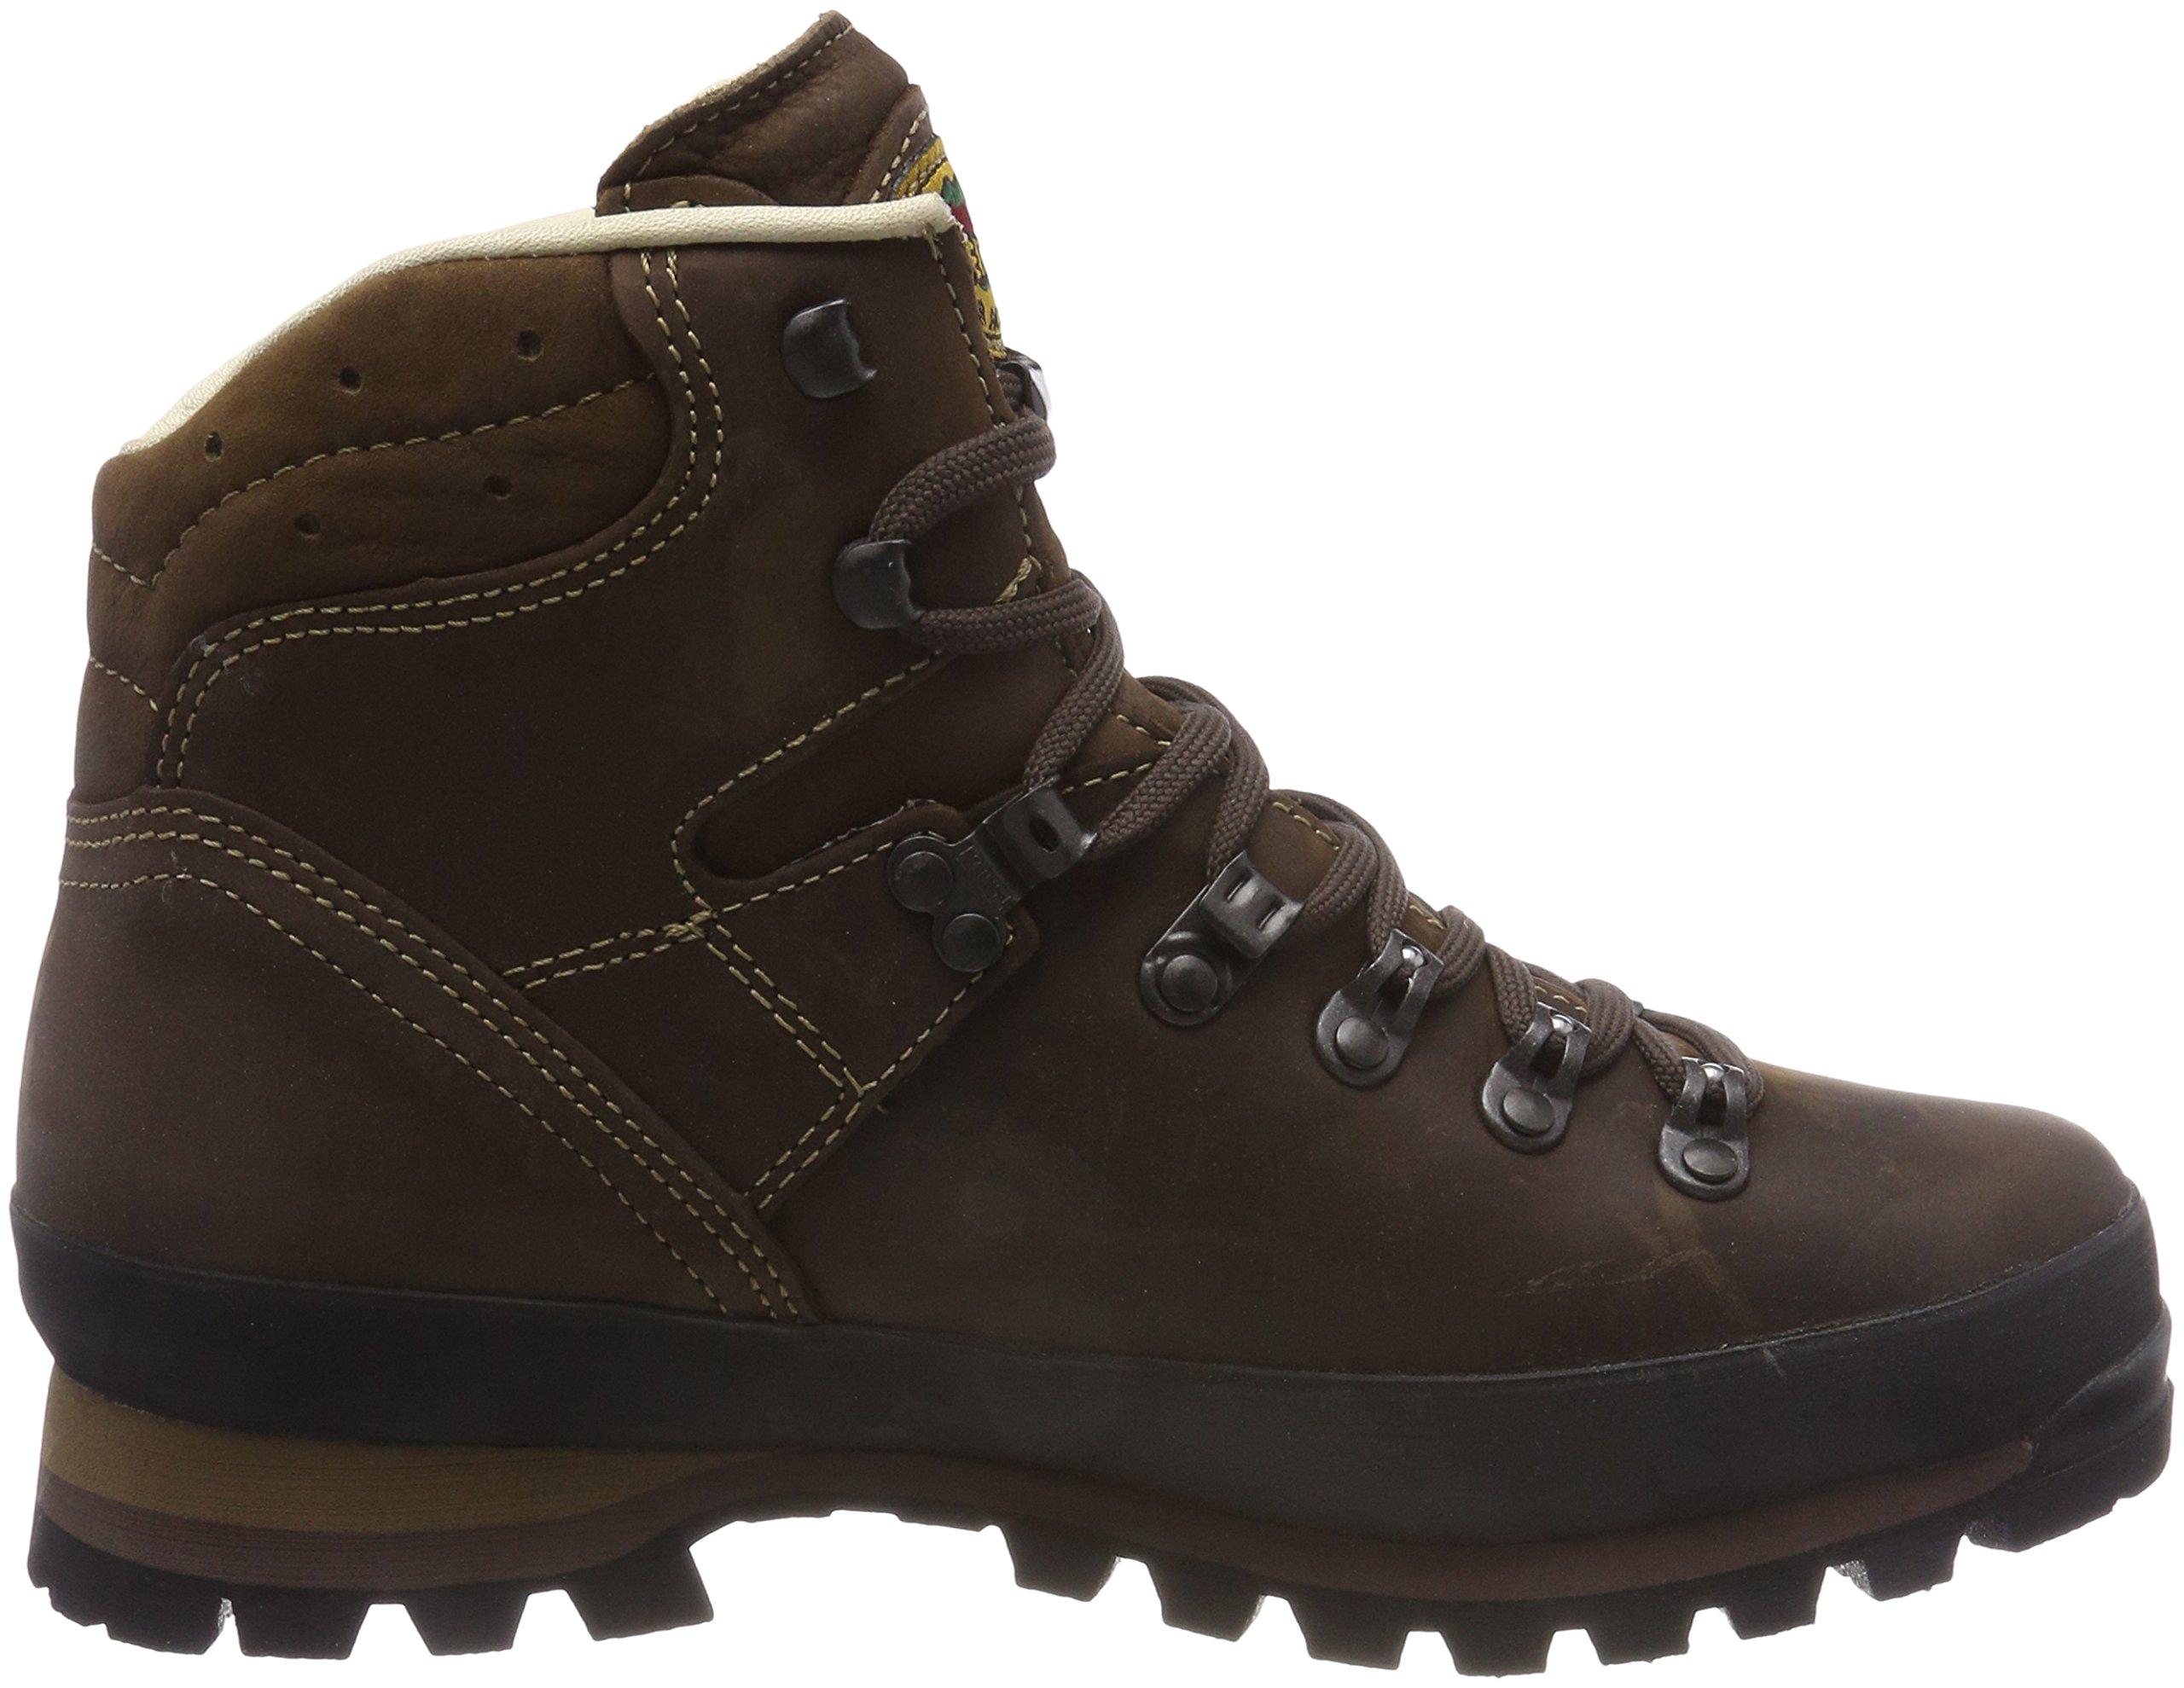 81 UUuvCojL - Meindl Women's Borneo Lady 2 MFS (XL) High Rise Hiking Shoes